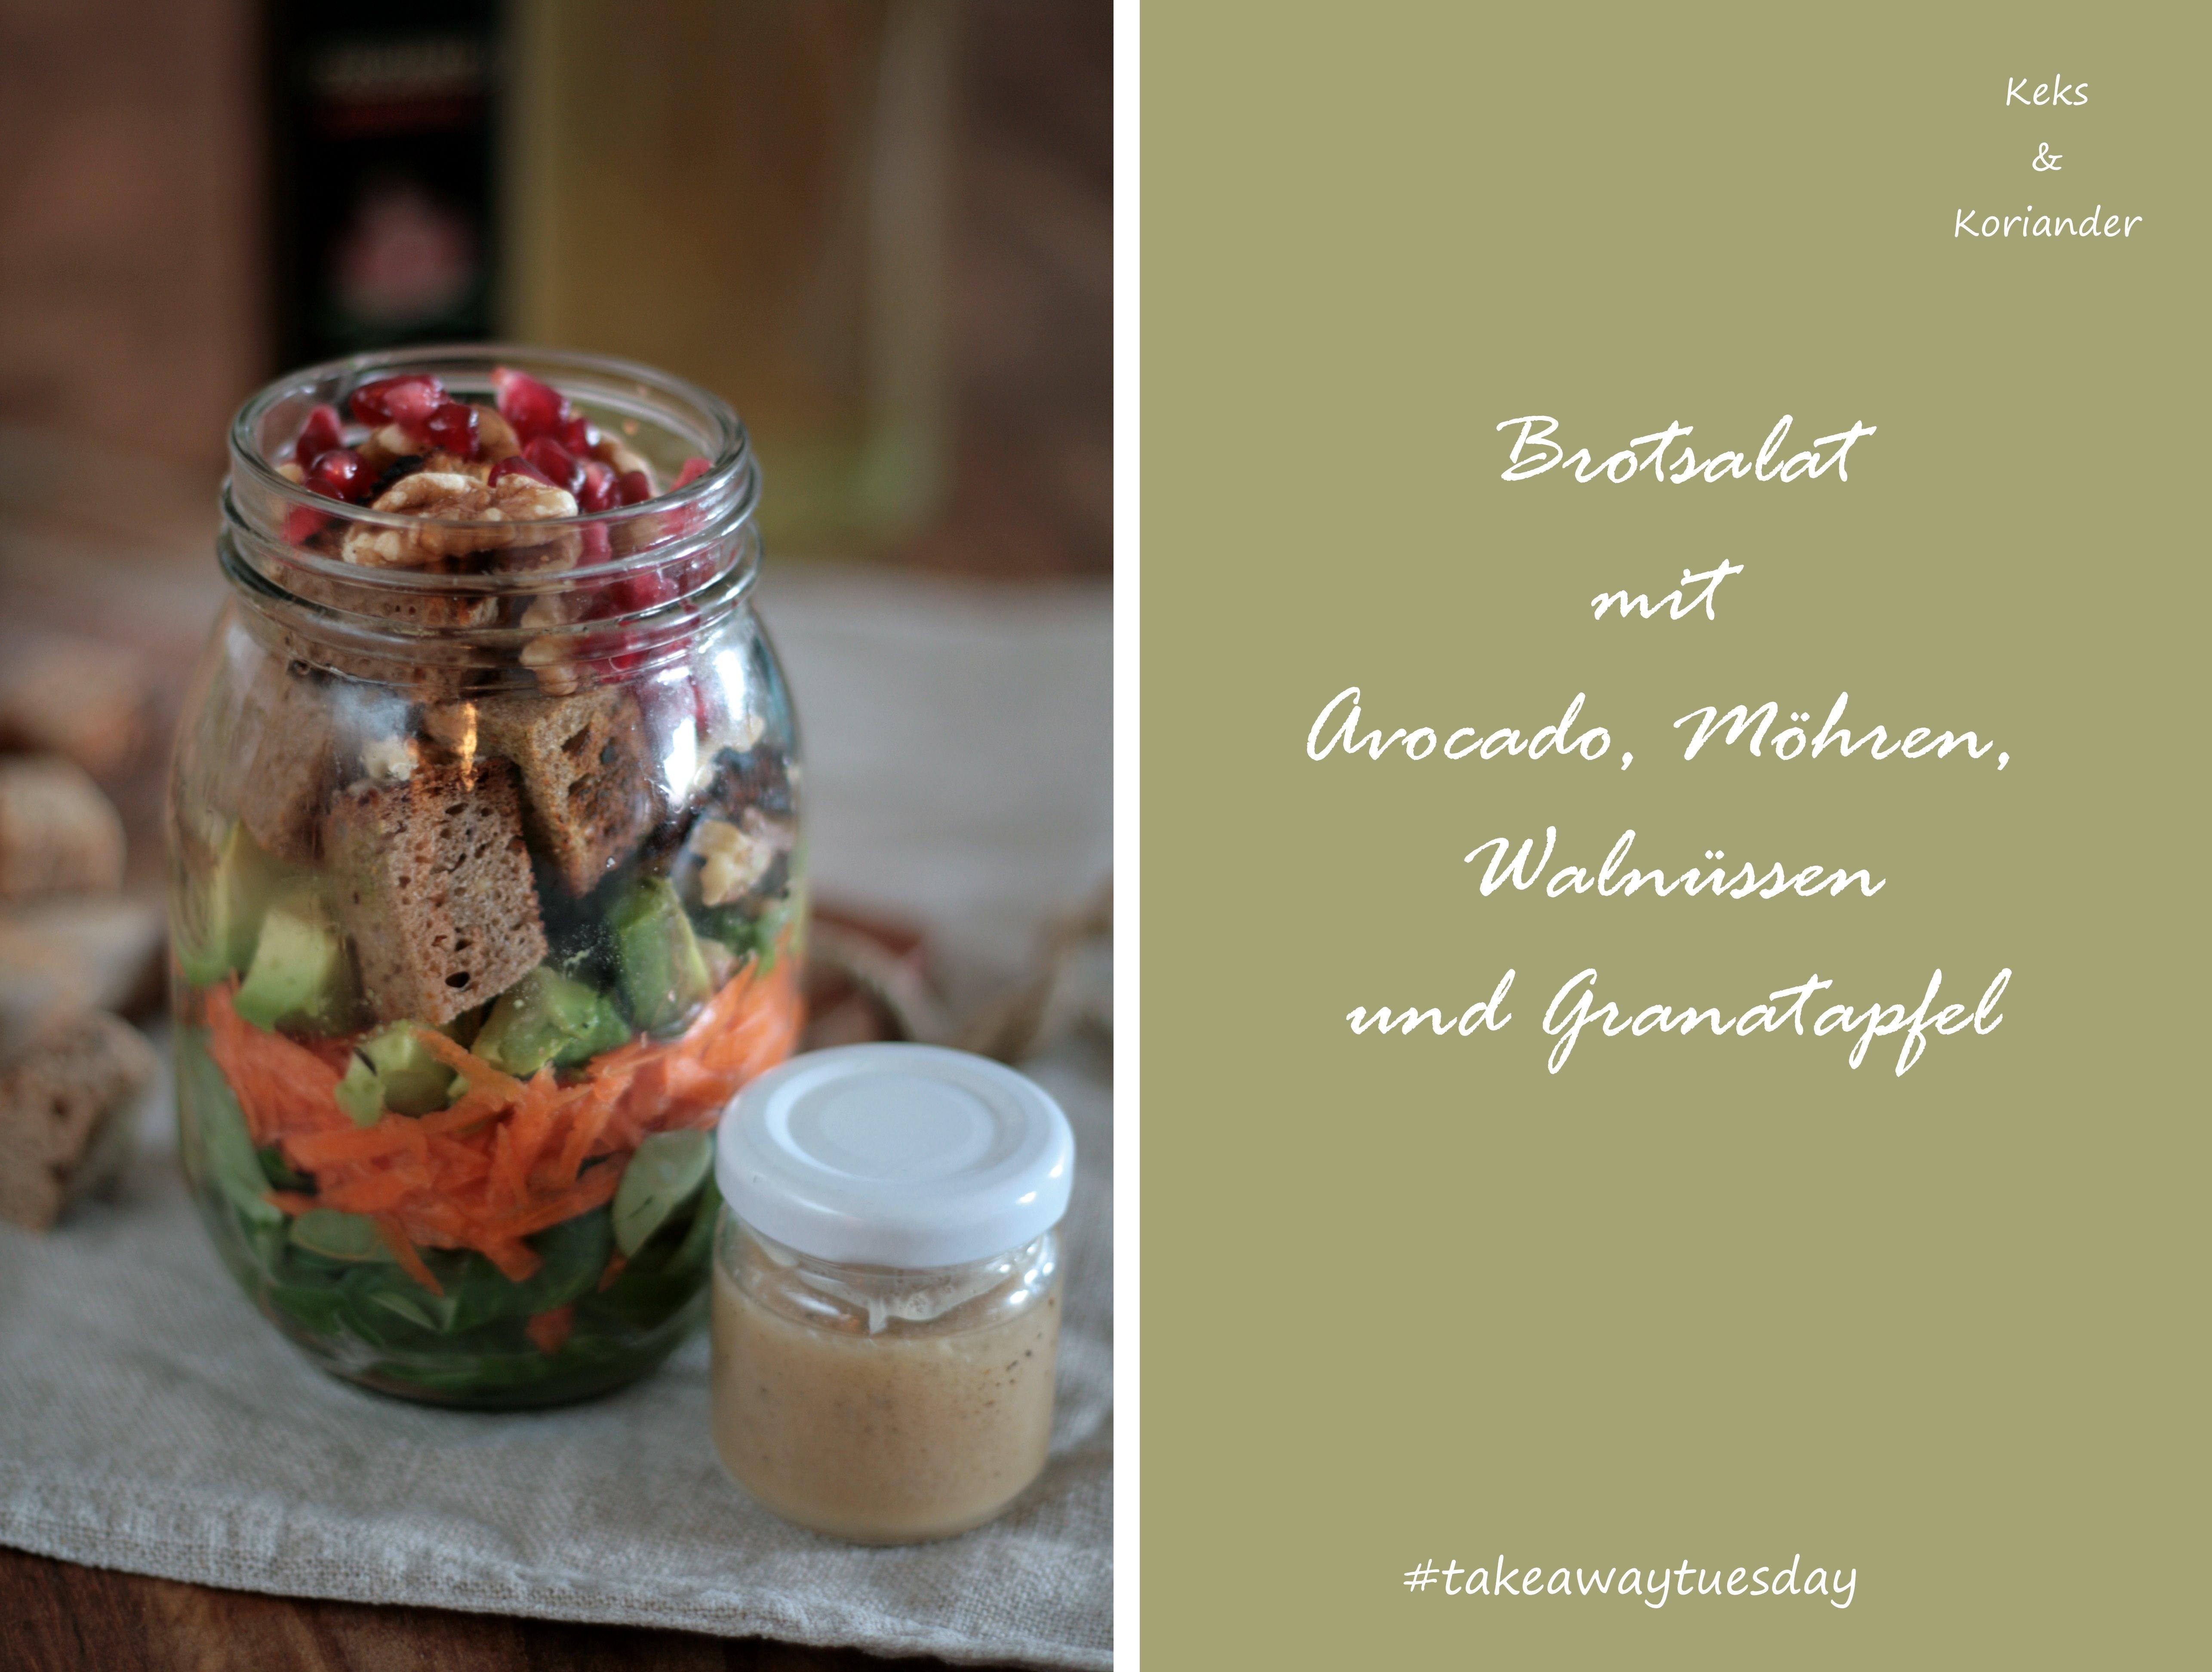 Brotsalat zum Mitnehmen mit Granatapfel, Avocado, Karotte, Feldsalat, Walnüssen 2